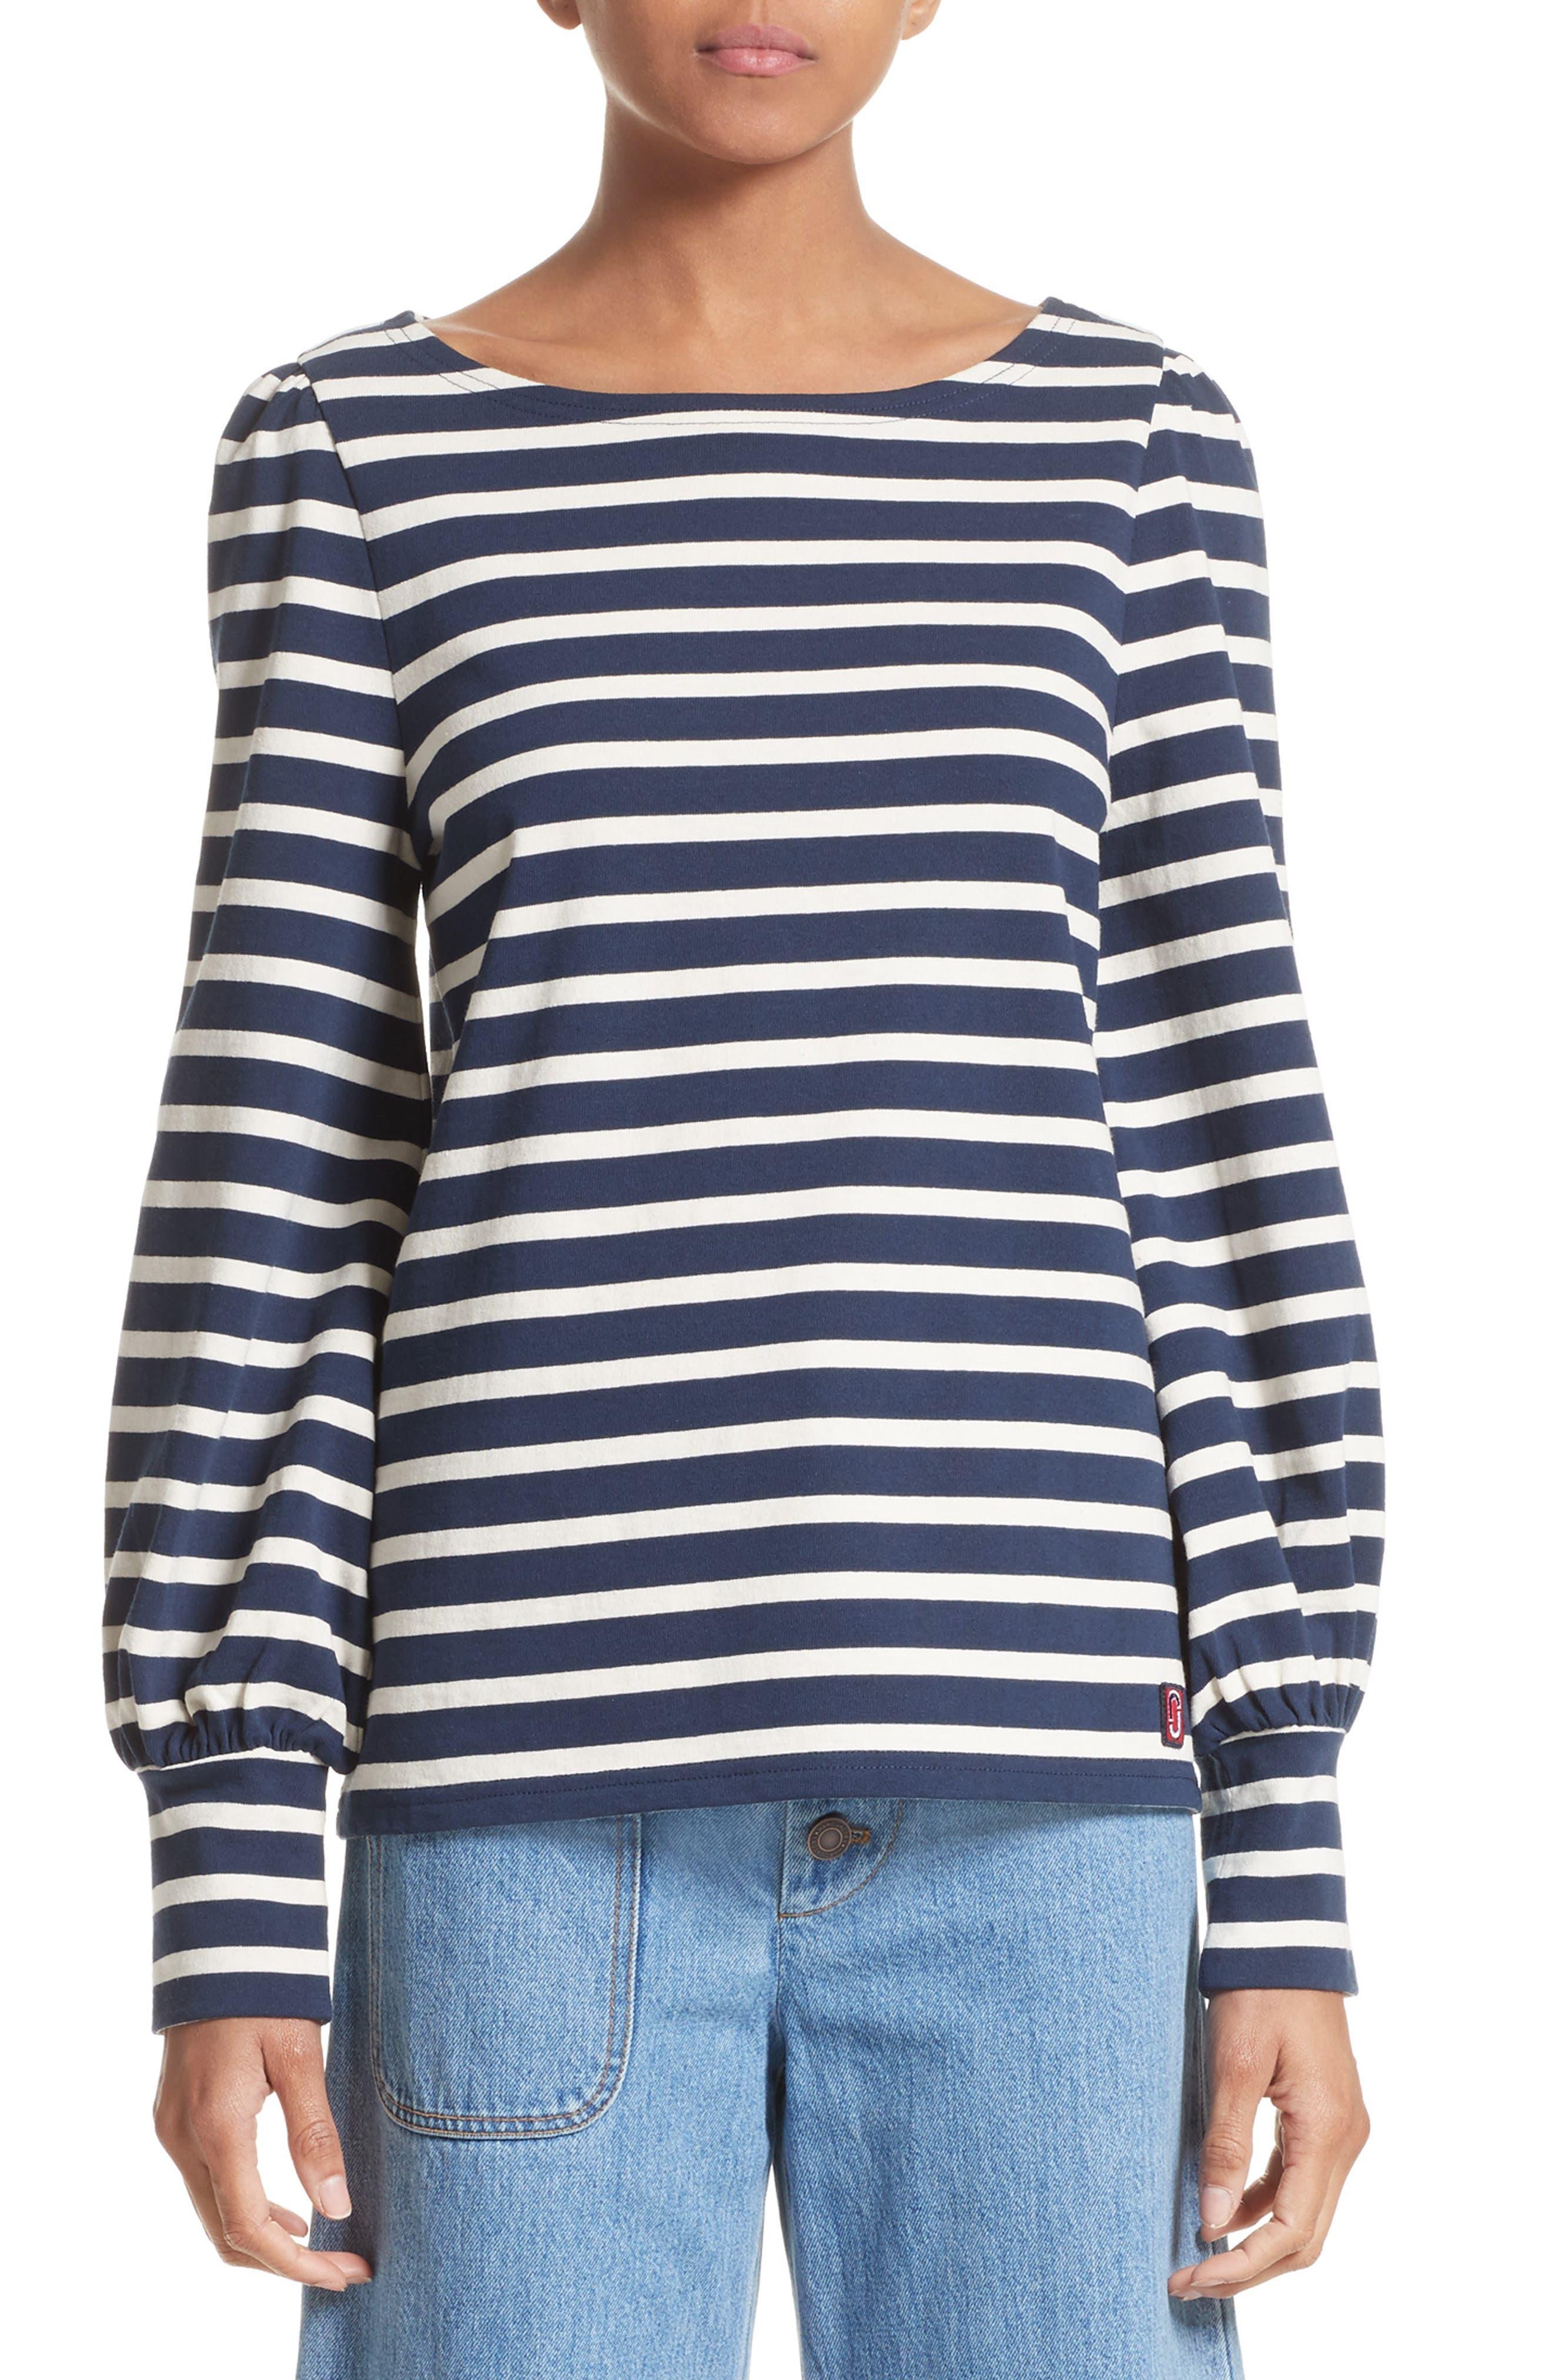 Alternate Image 1 Selected - MARC JACOBS Reverse Breton Stripe Bell Sleeve Top